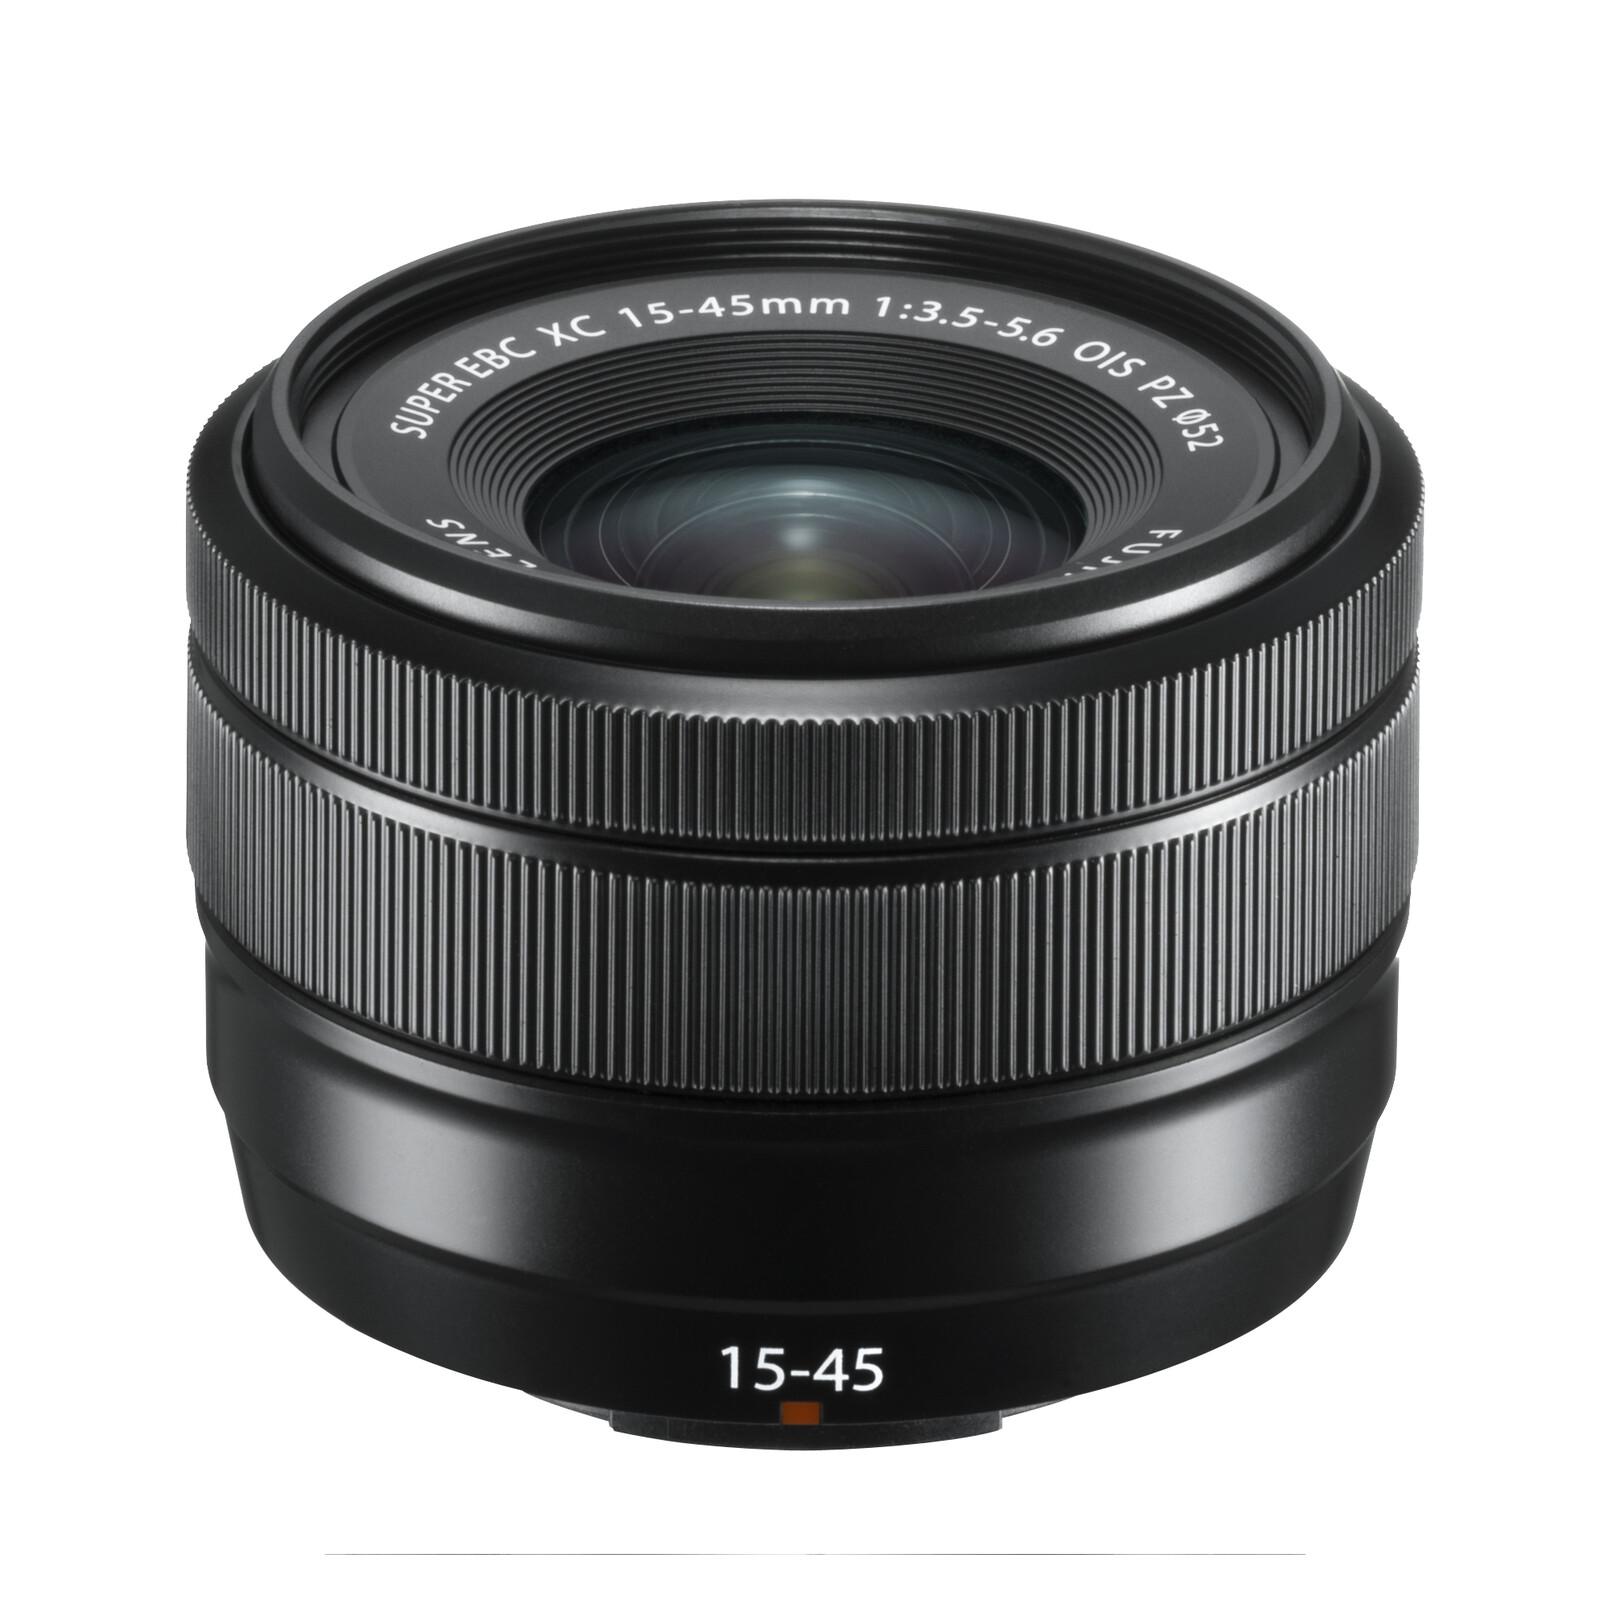 Fujinon XC 15-45/3,5-5,6 OIS PZ + UV Filter